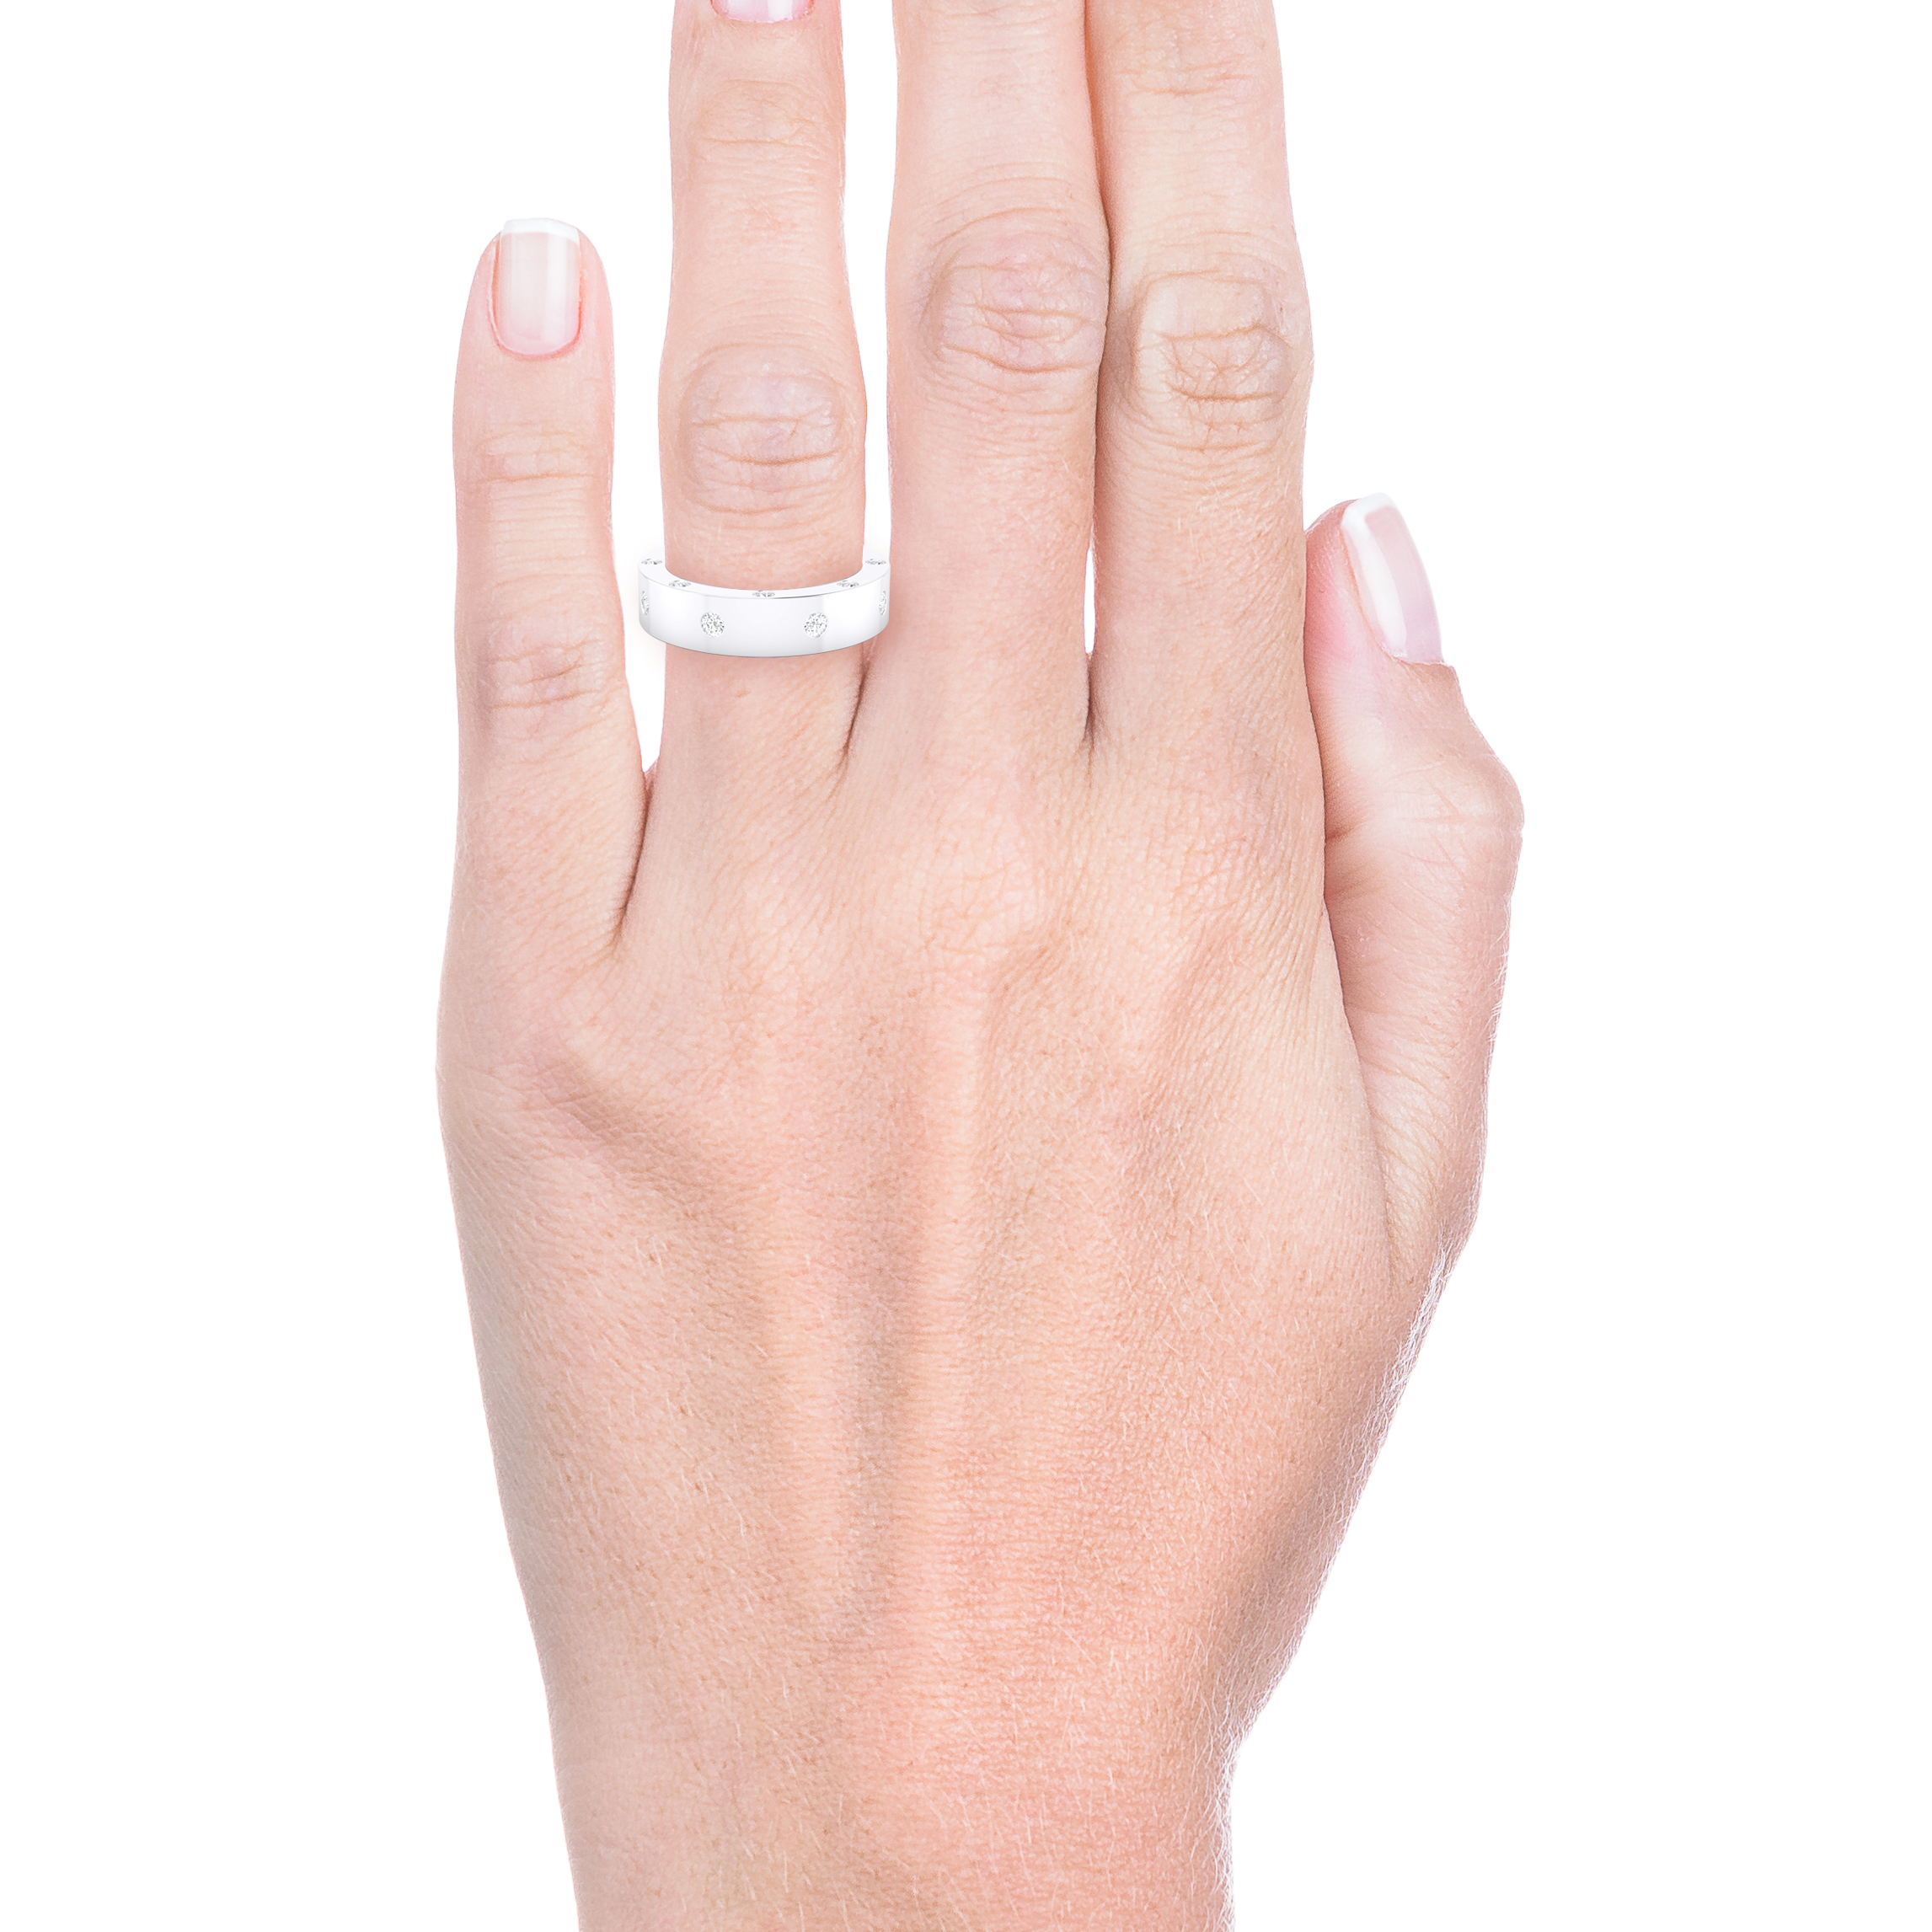 Anillos de compromiso de oro blanco de 18k con 16 diamantes